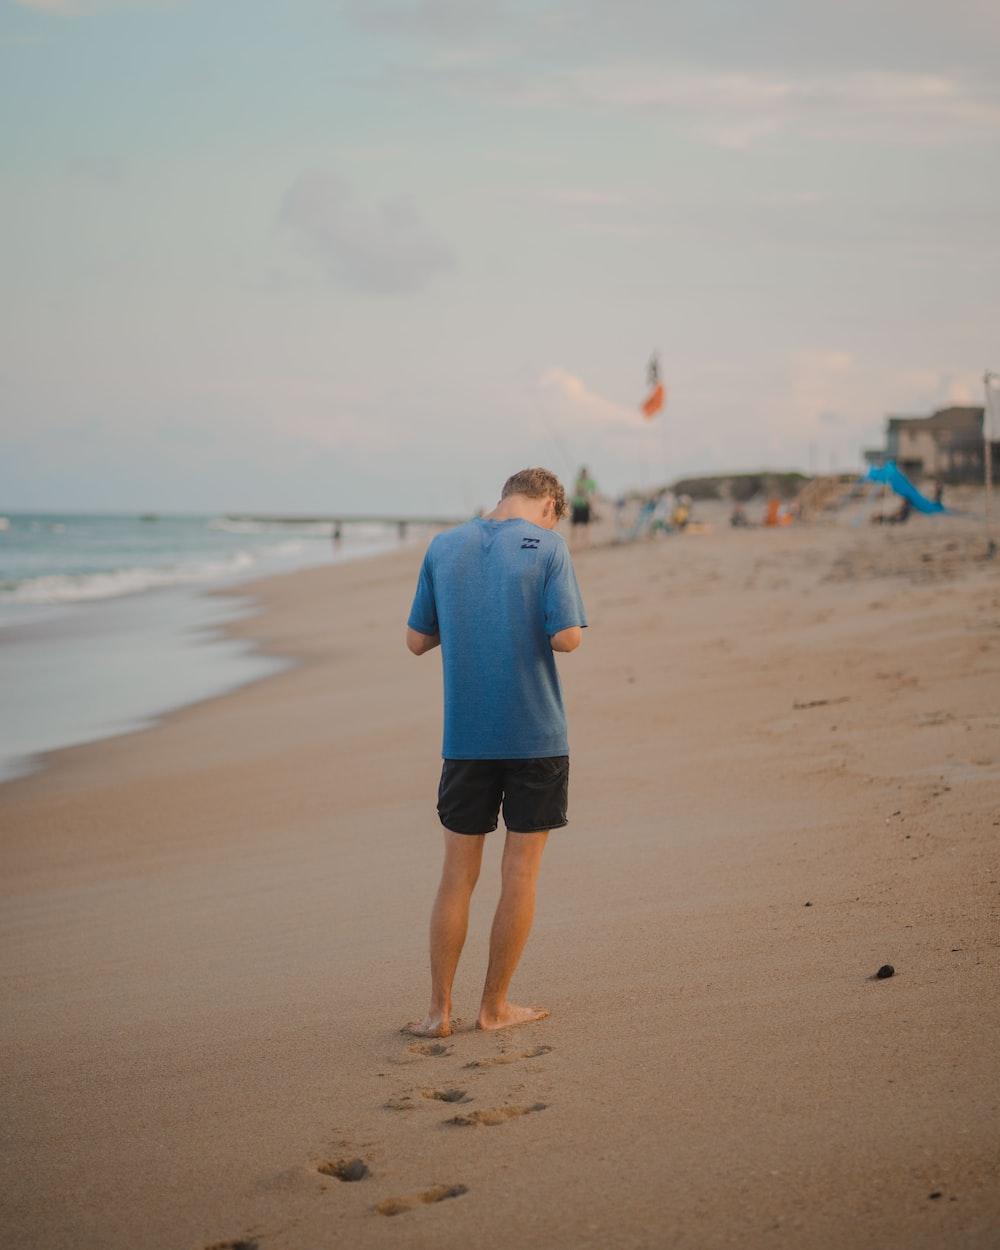 man in blue dress shirt and black shorts walking on beach during daytime